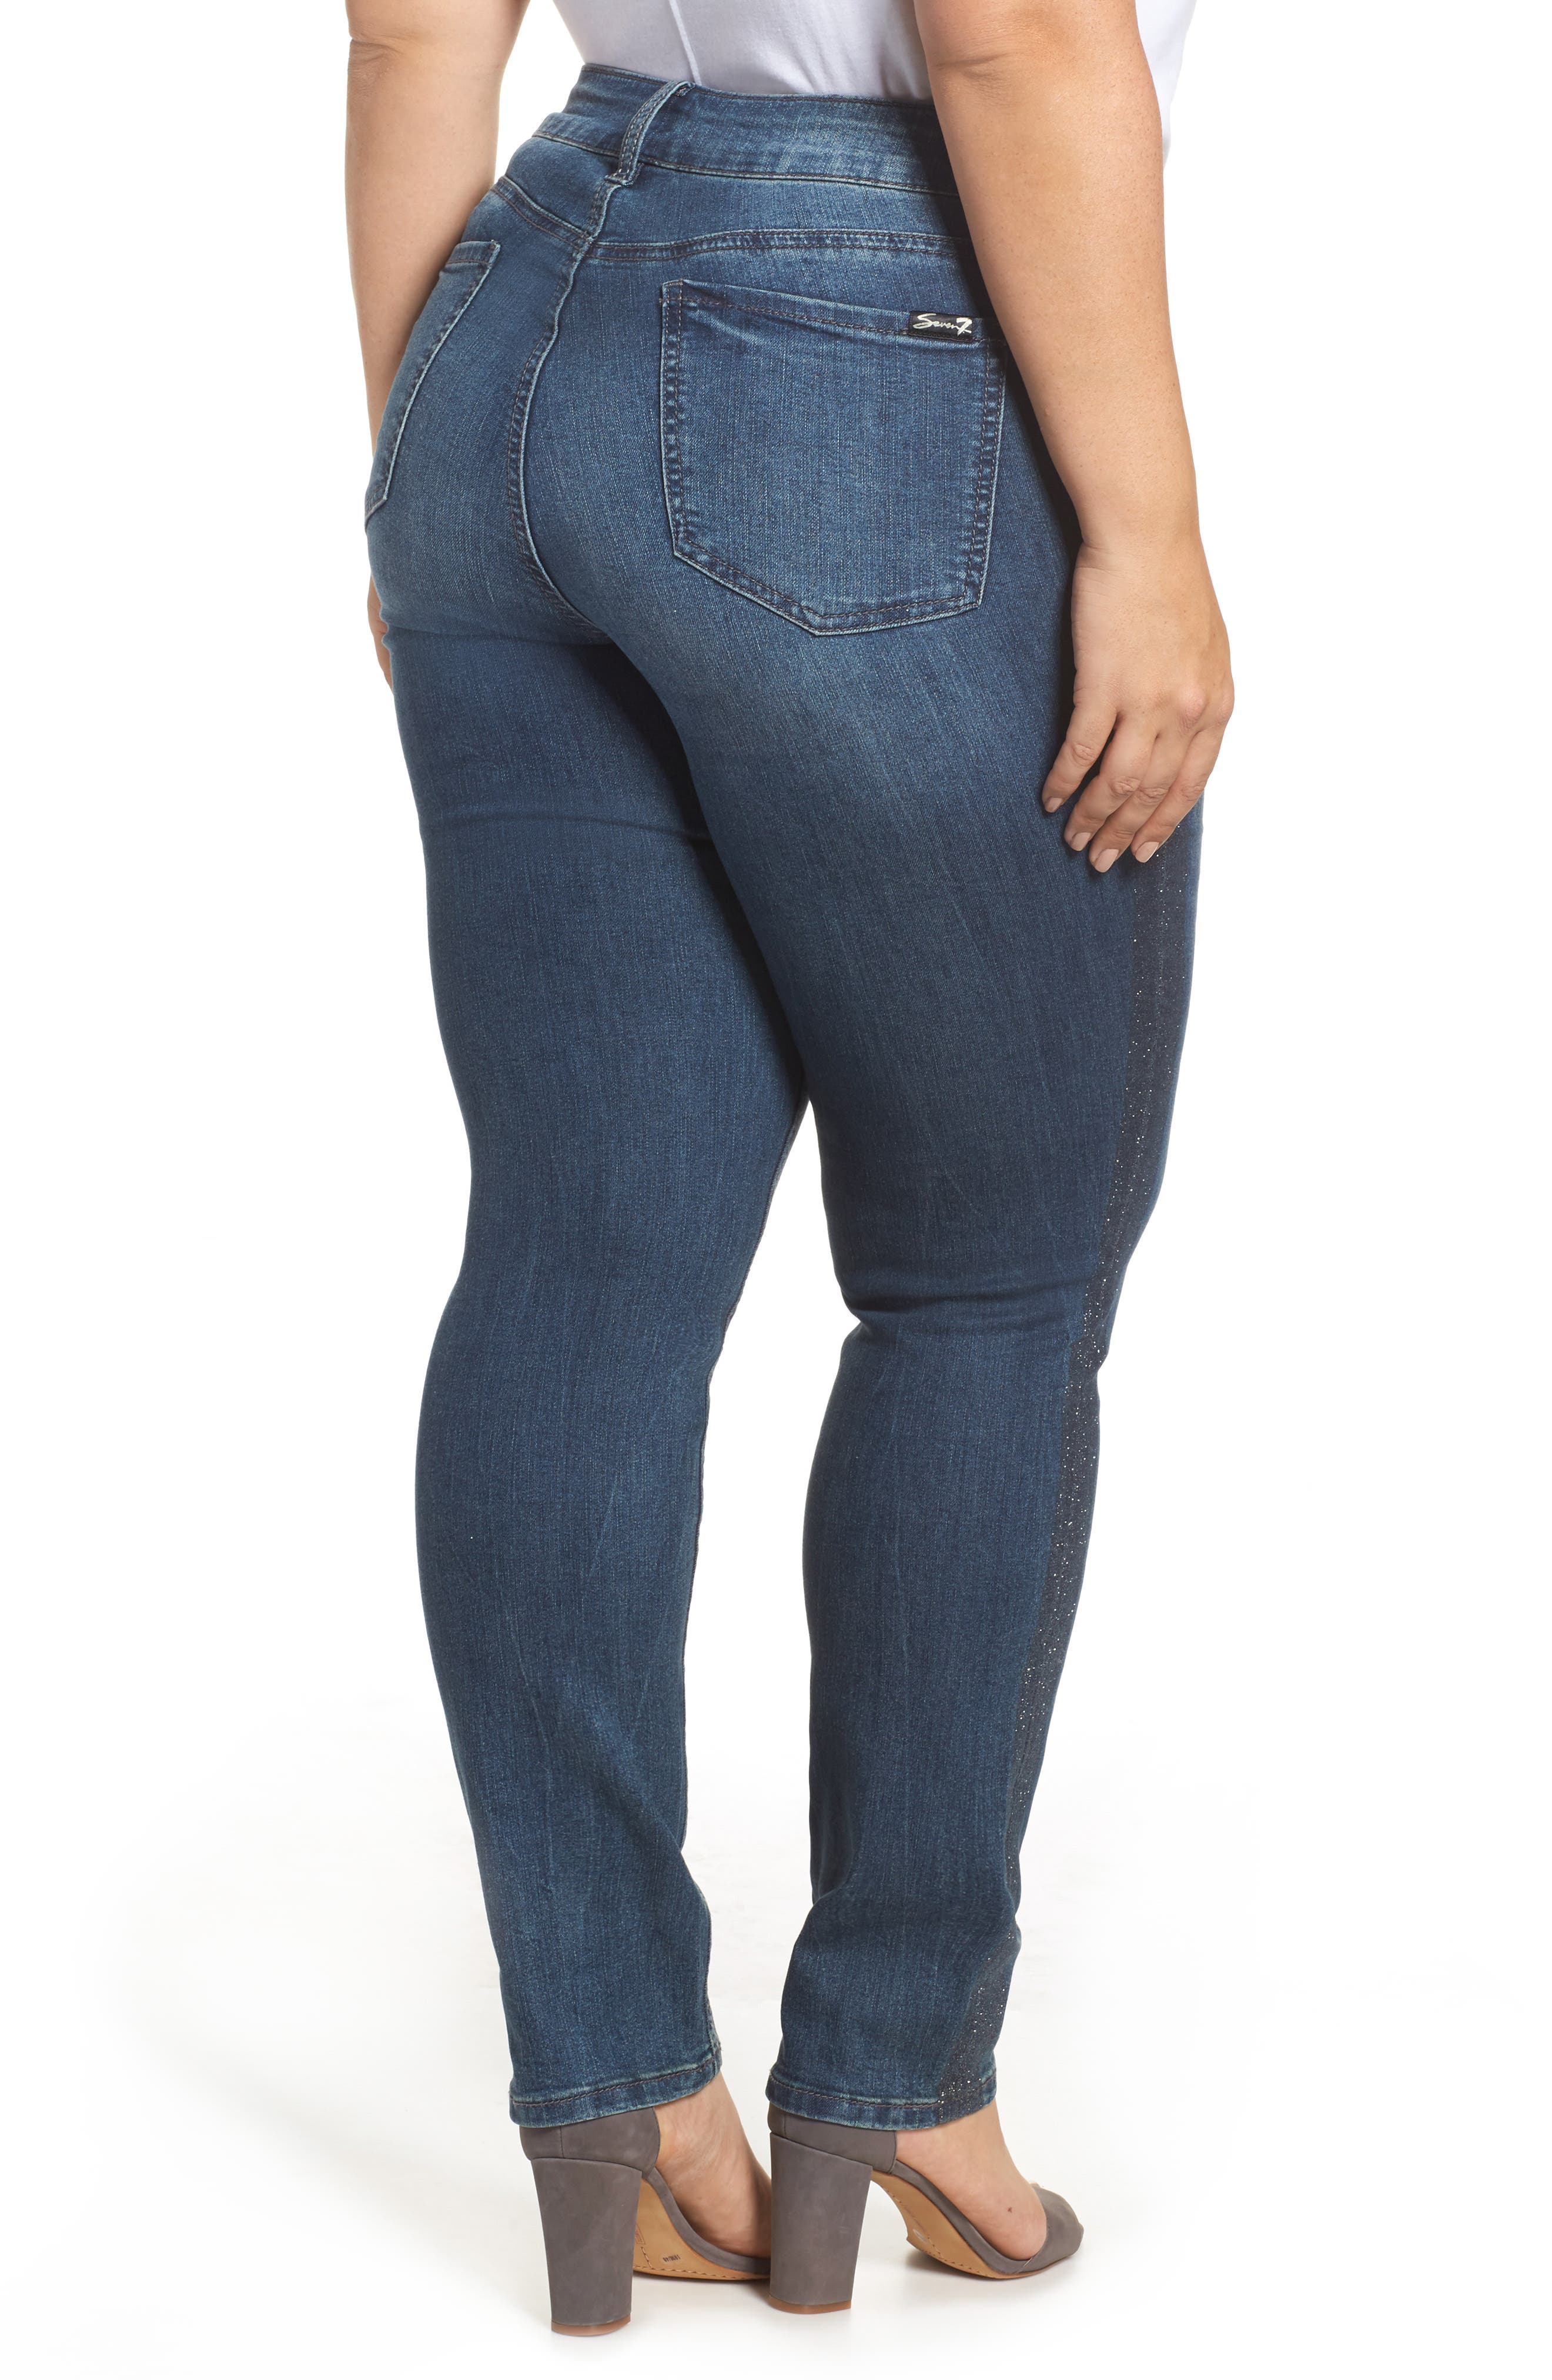 Alternate Image 2  - Seven7 Printed Foil Tuxedo Stripe Skinny Jeans (Locke) (Plus Size)